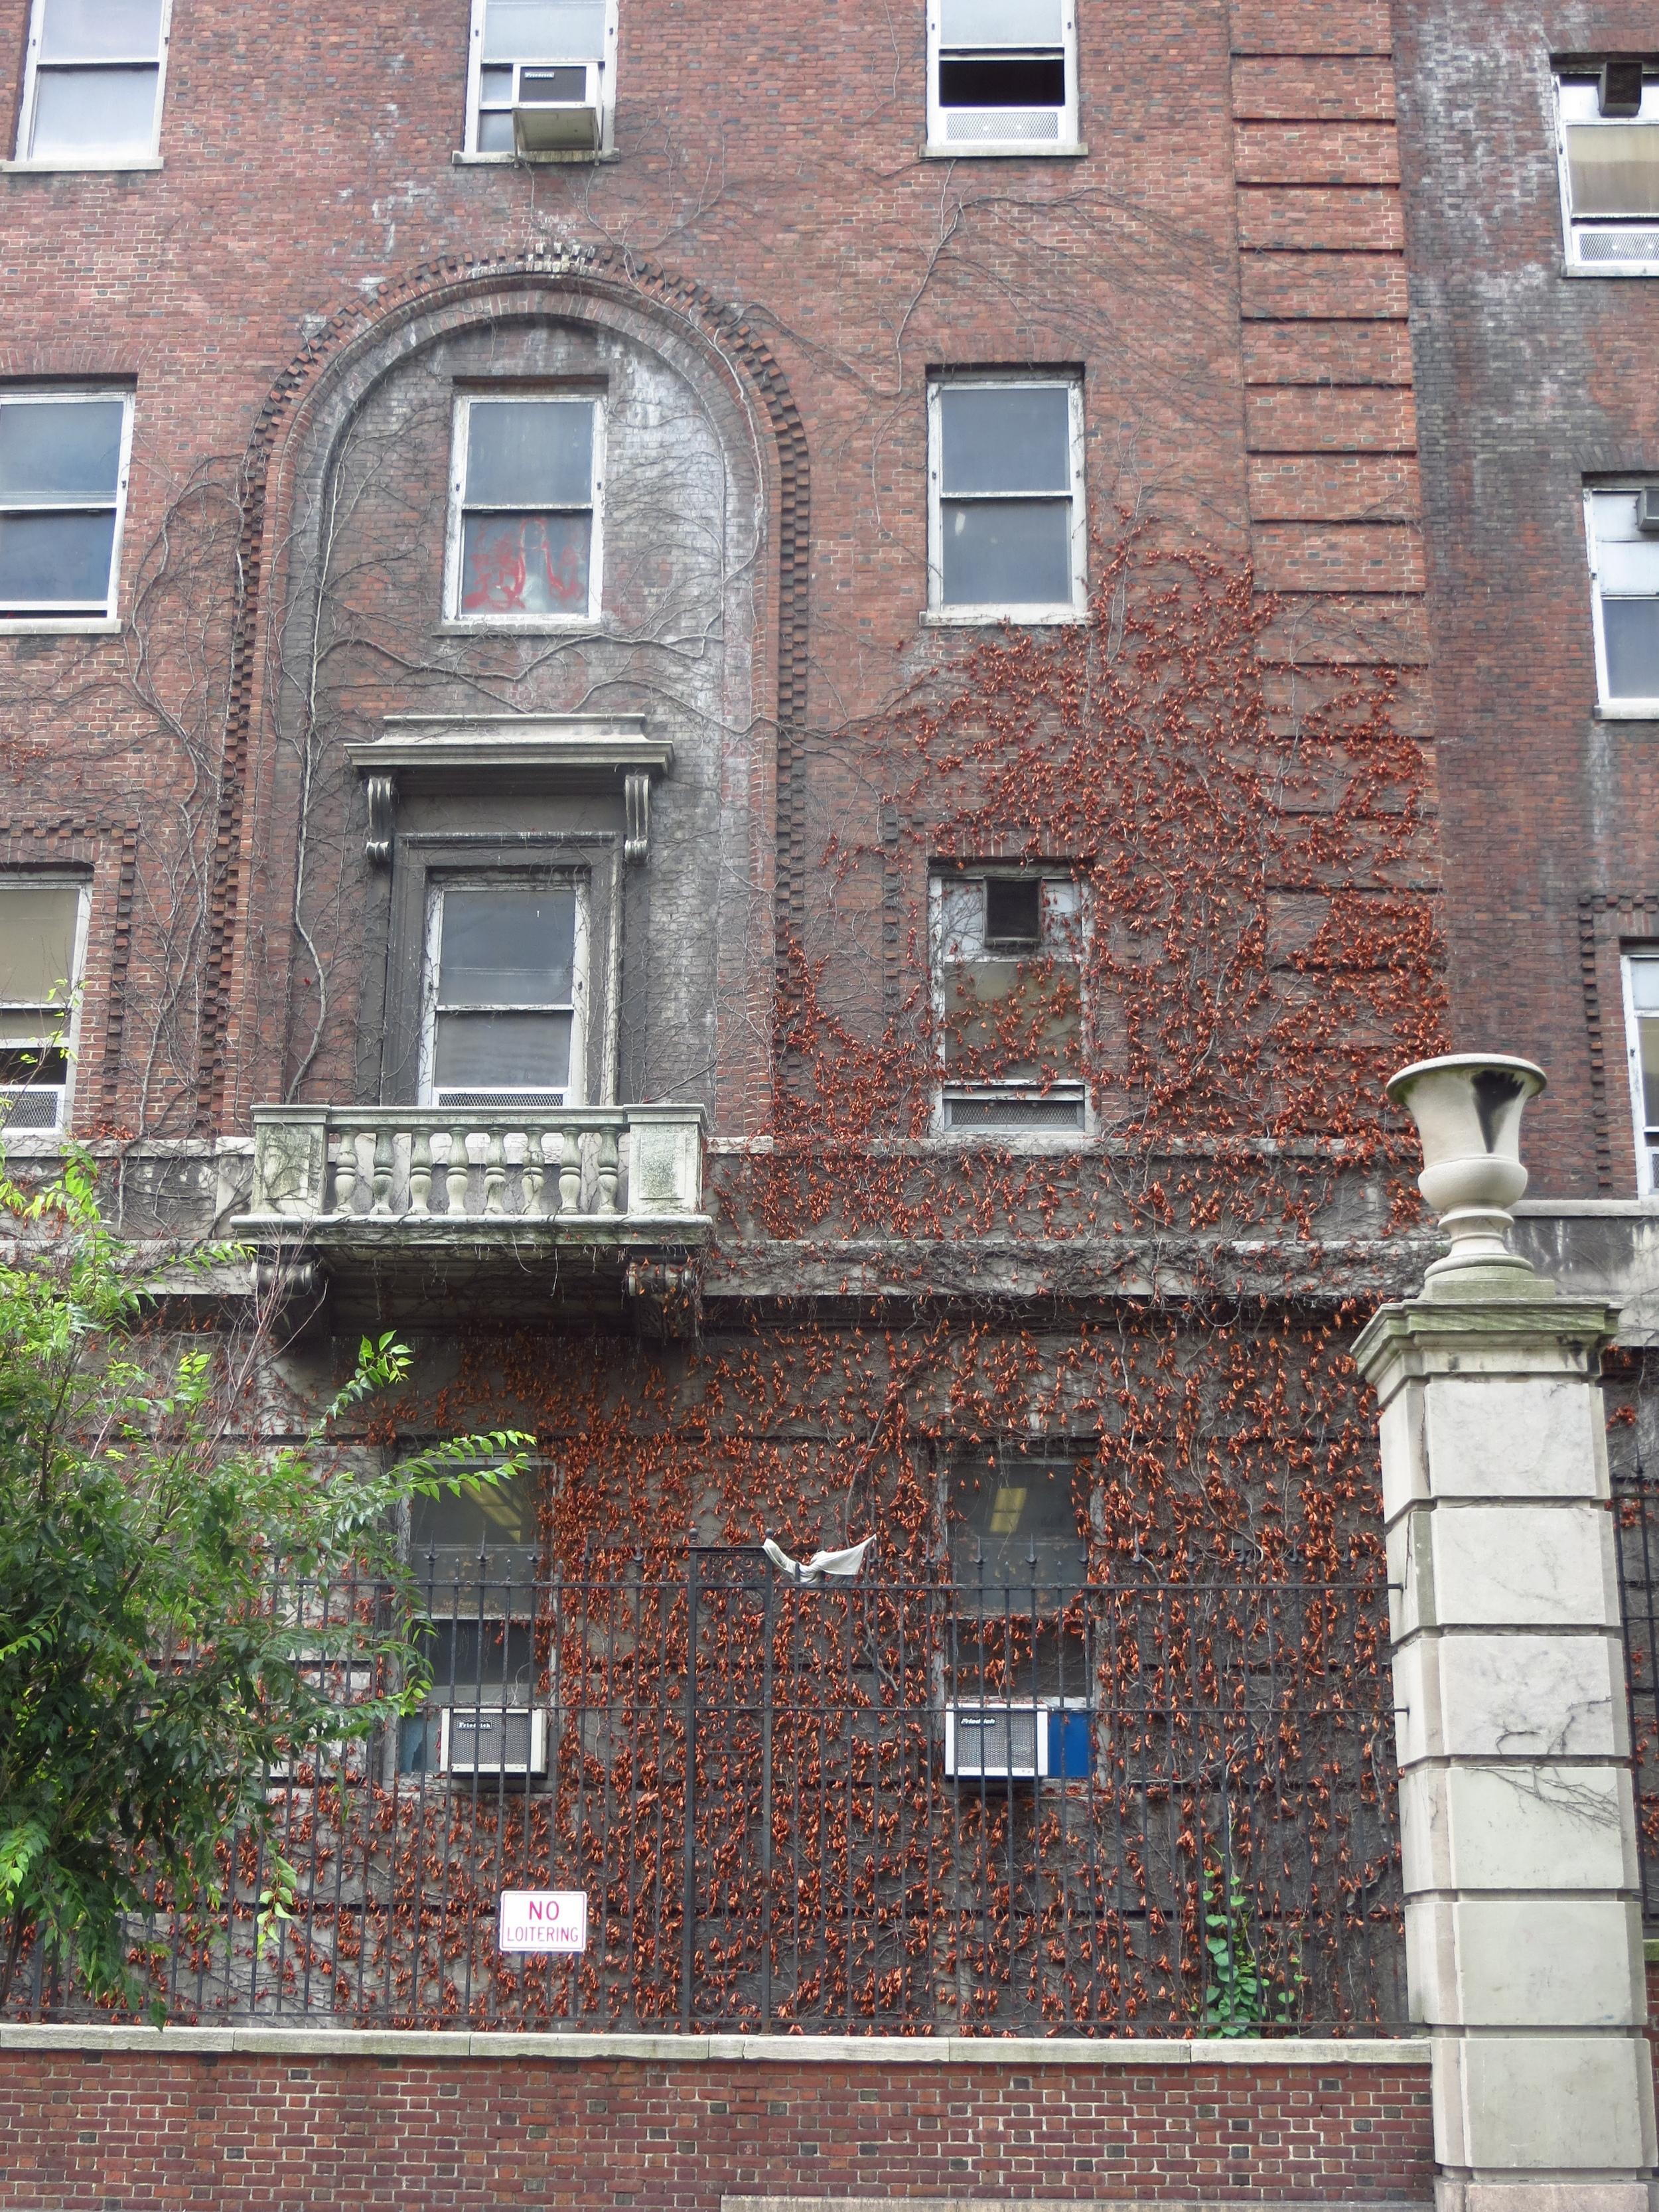 (it looks like a former psychiatric hospital...)